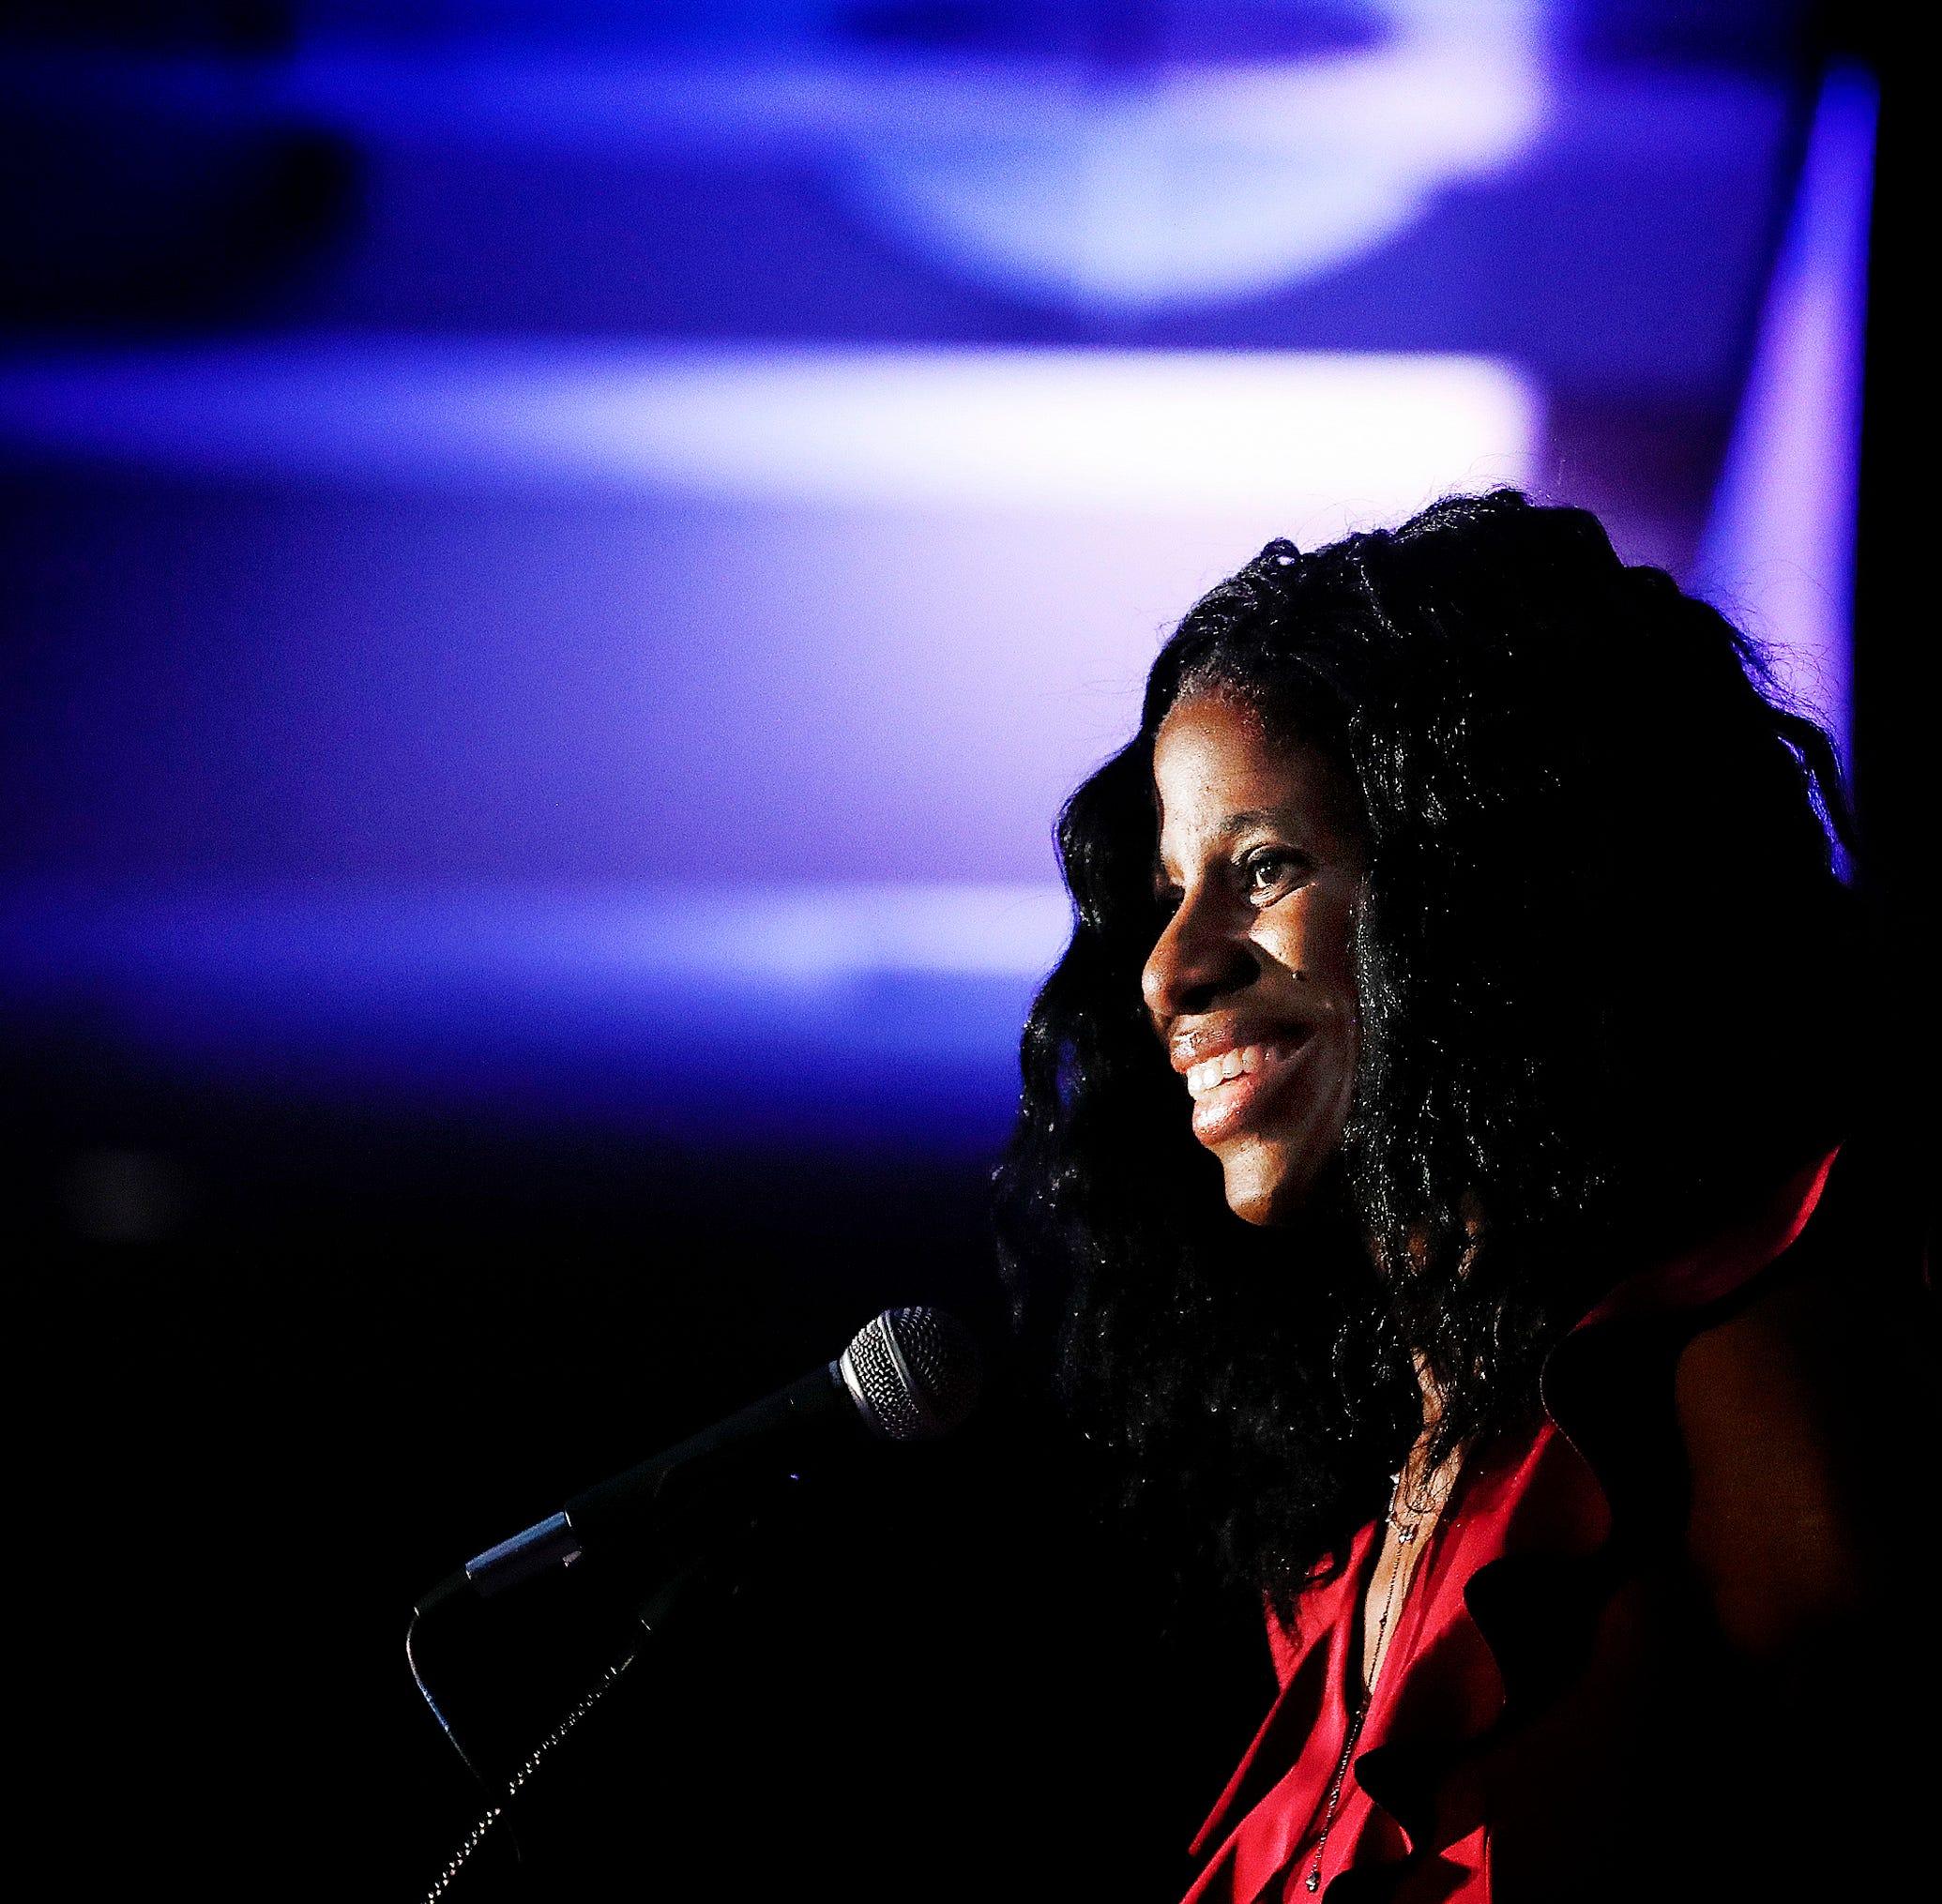 Jaren Jackson Jr.'s family, led by mom Terri Carmichael Jackson, is investing in Memphis, investing in girls